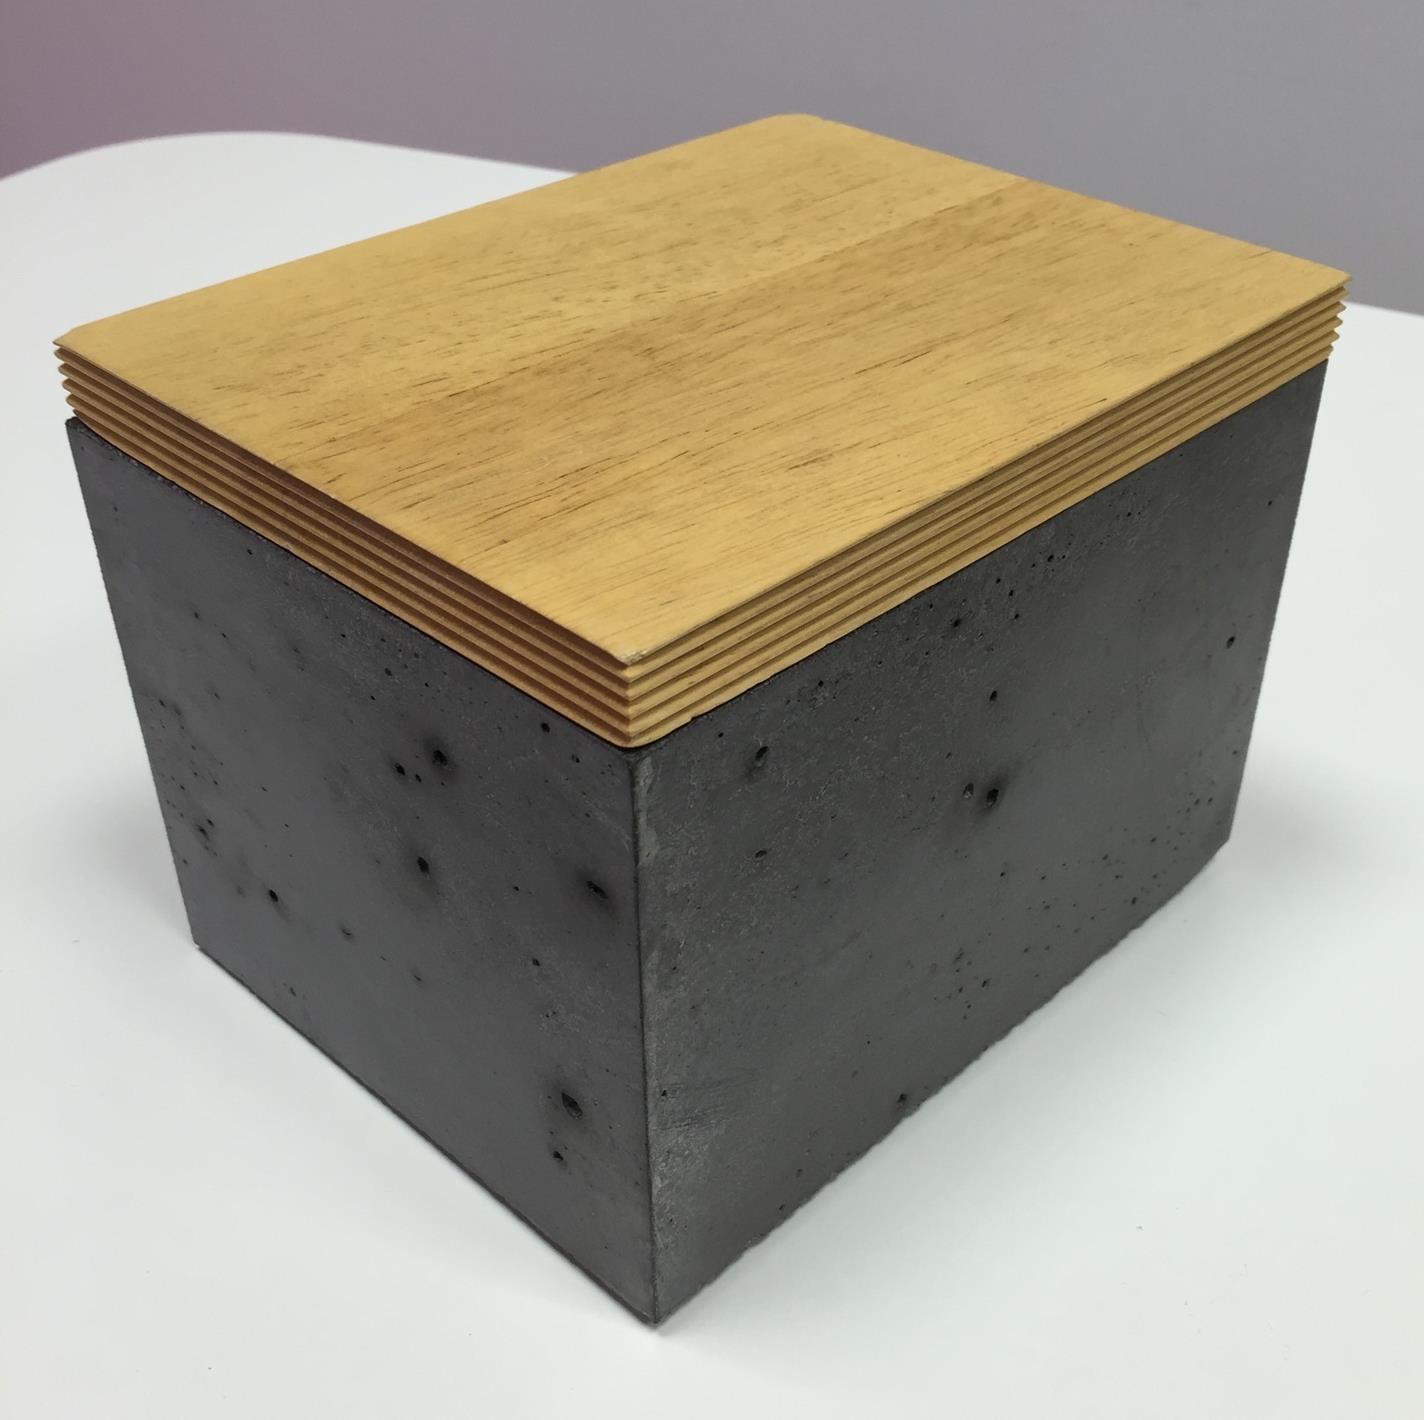 Arbeitsplatten aus Beton DIY - Anleitung mit Betonrezept - Bigmeatlove